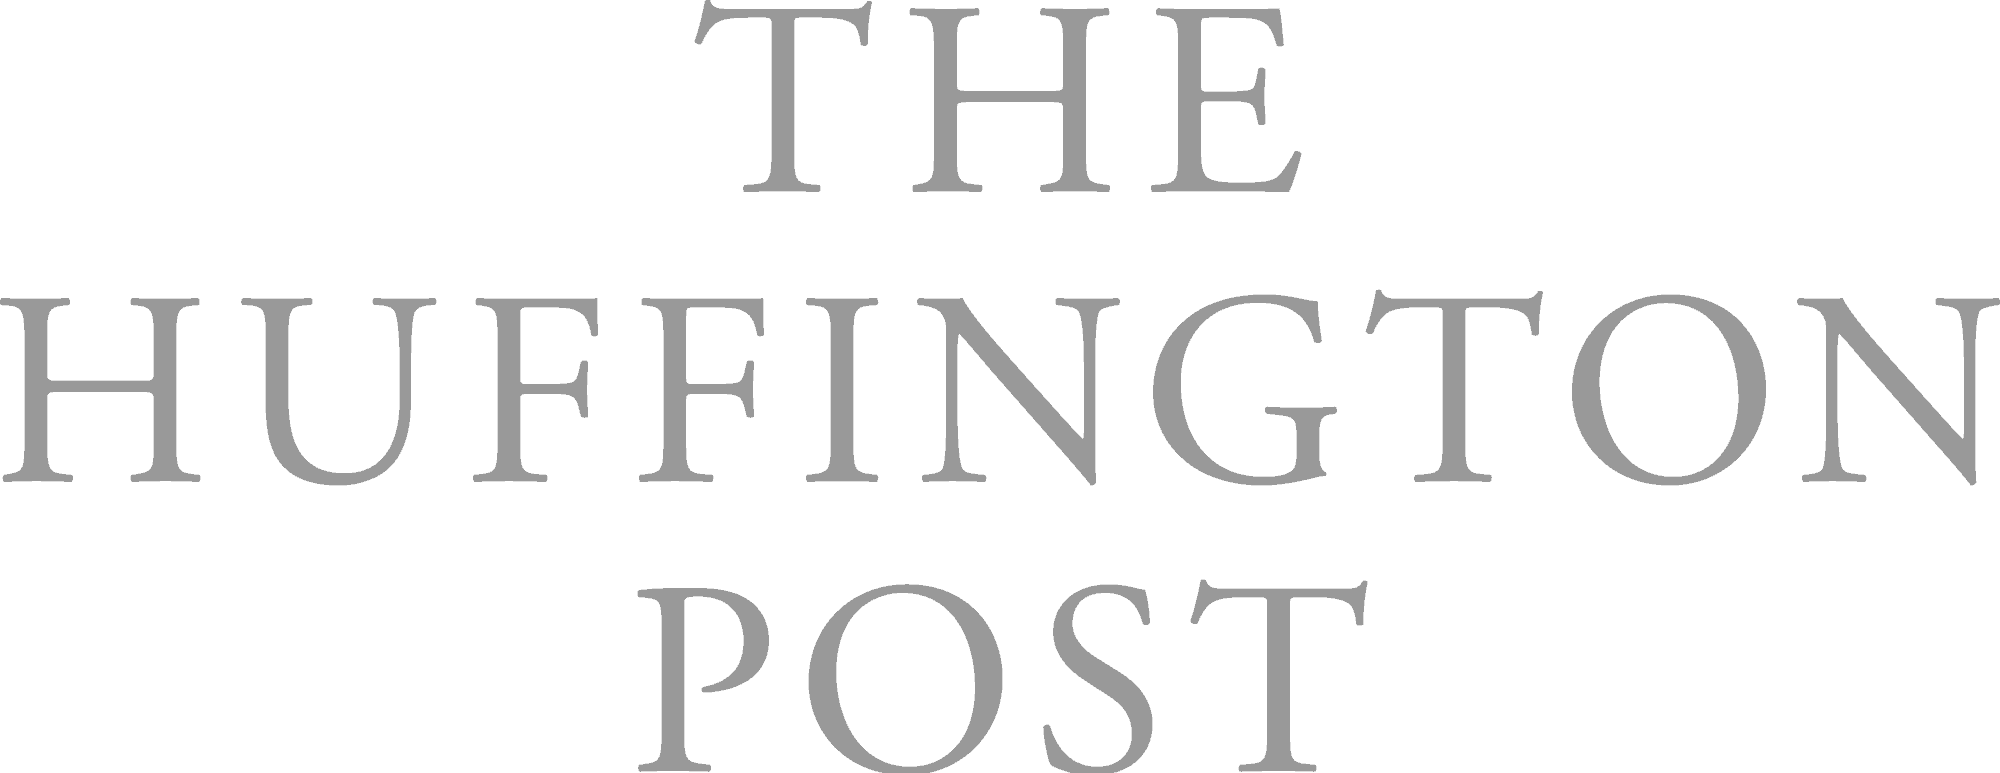 the-huffington-post-logo